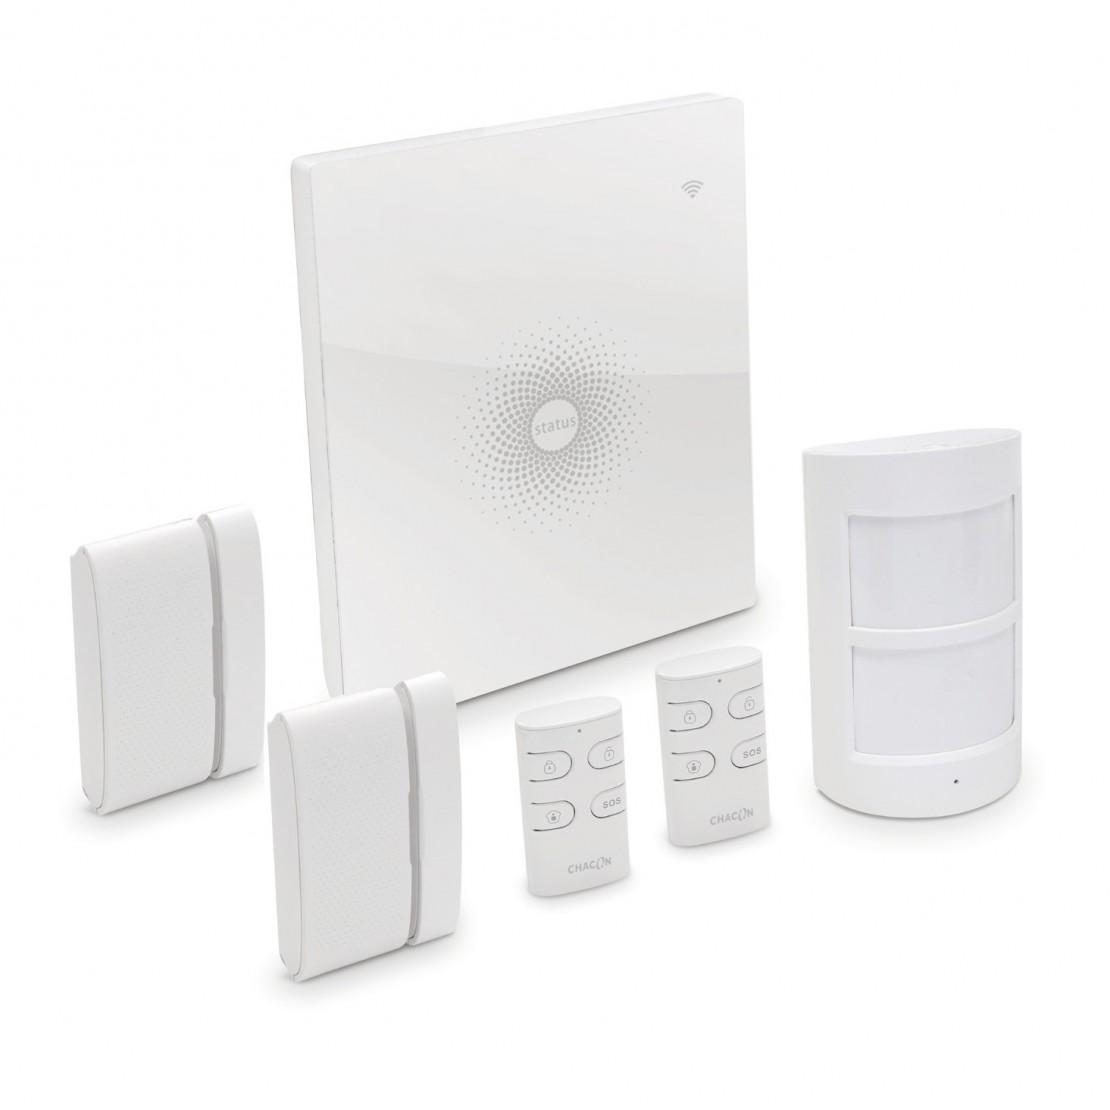 Système d'alarme Wi-Fi sans fi l + tactile